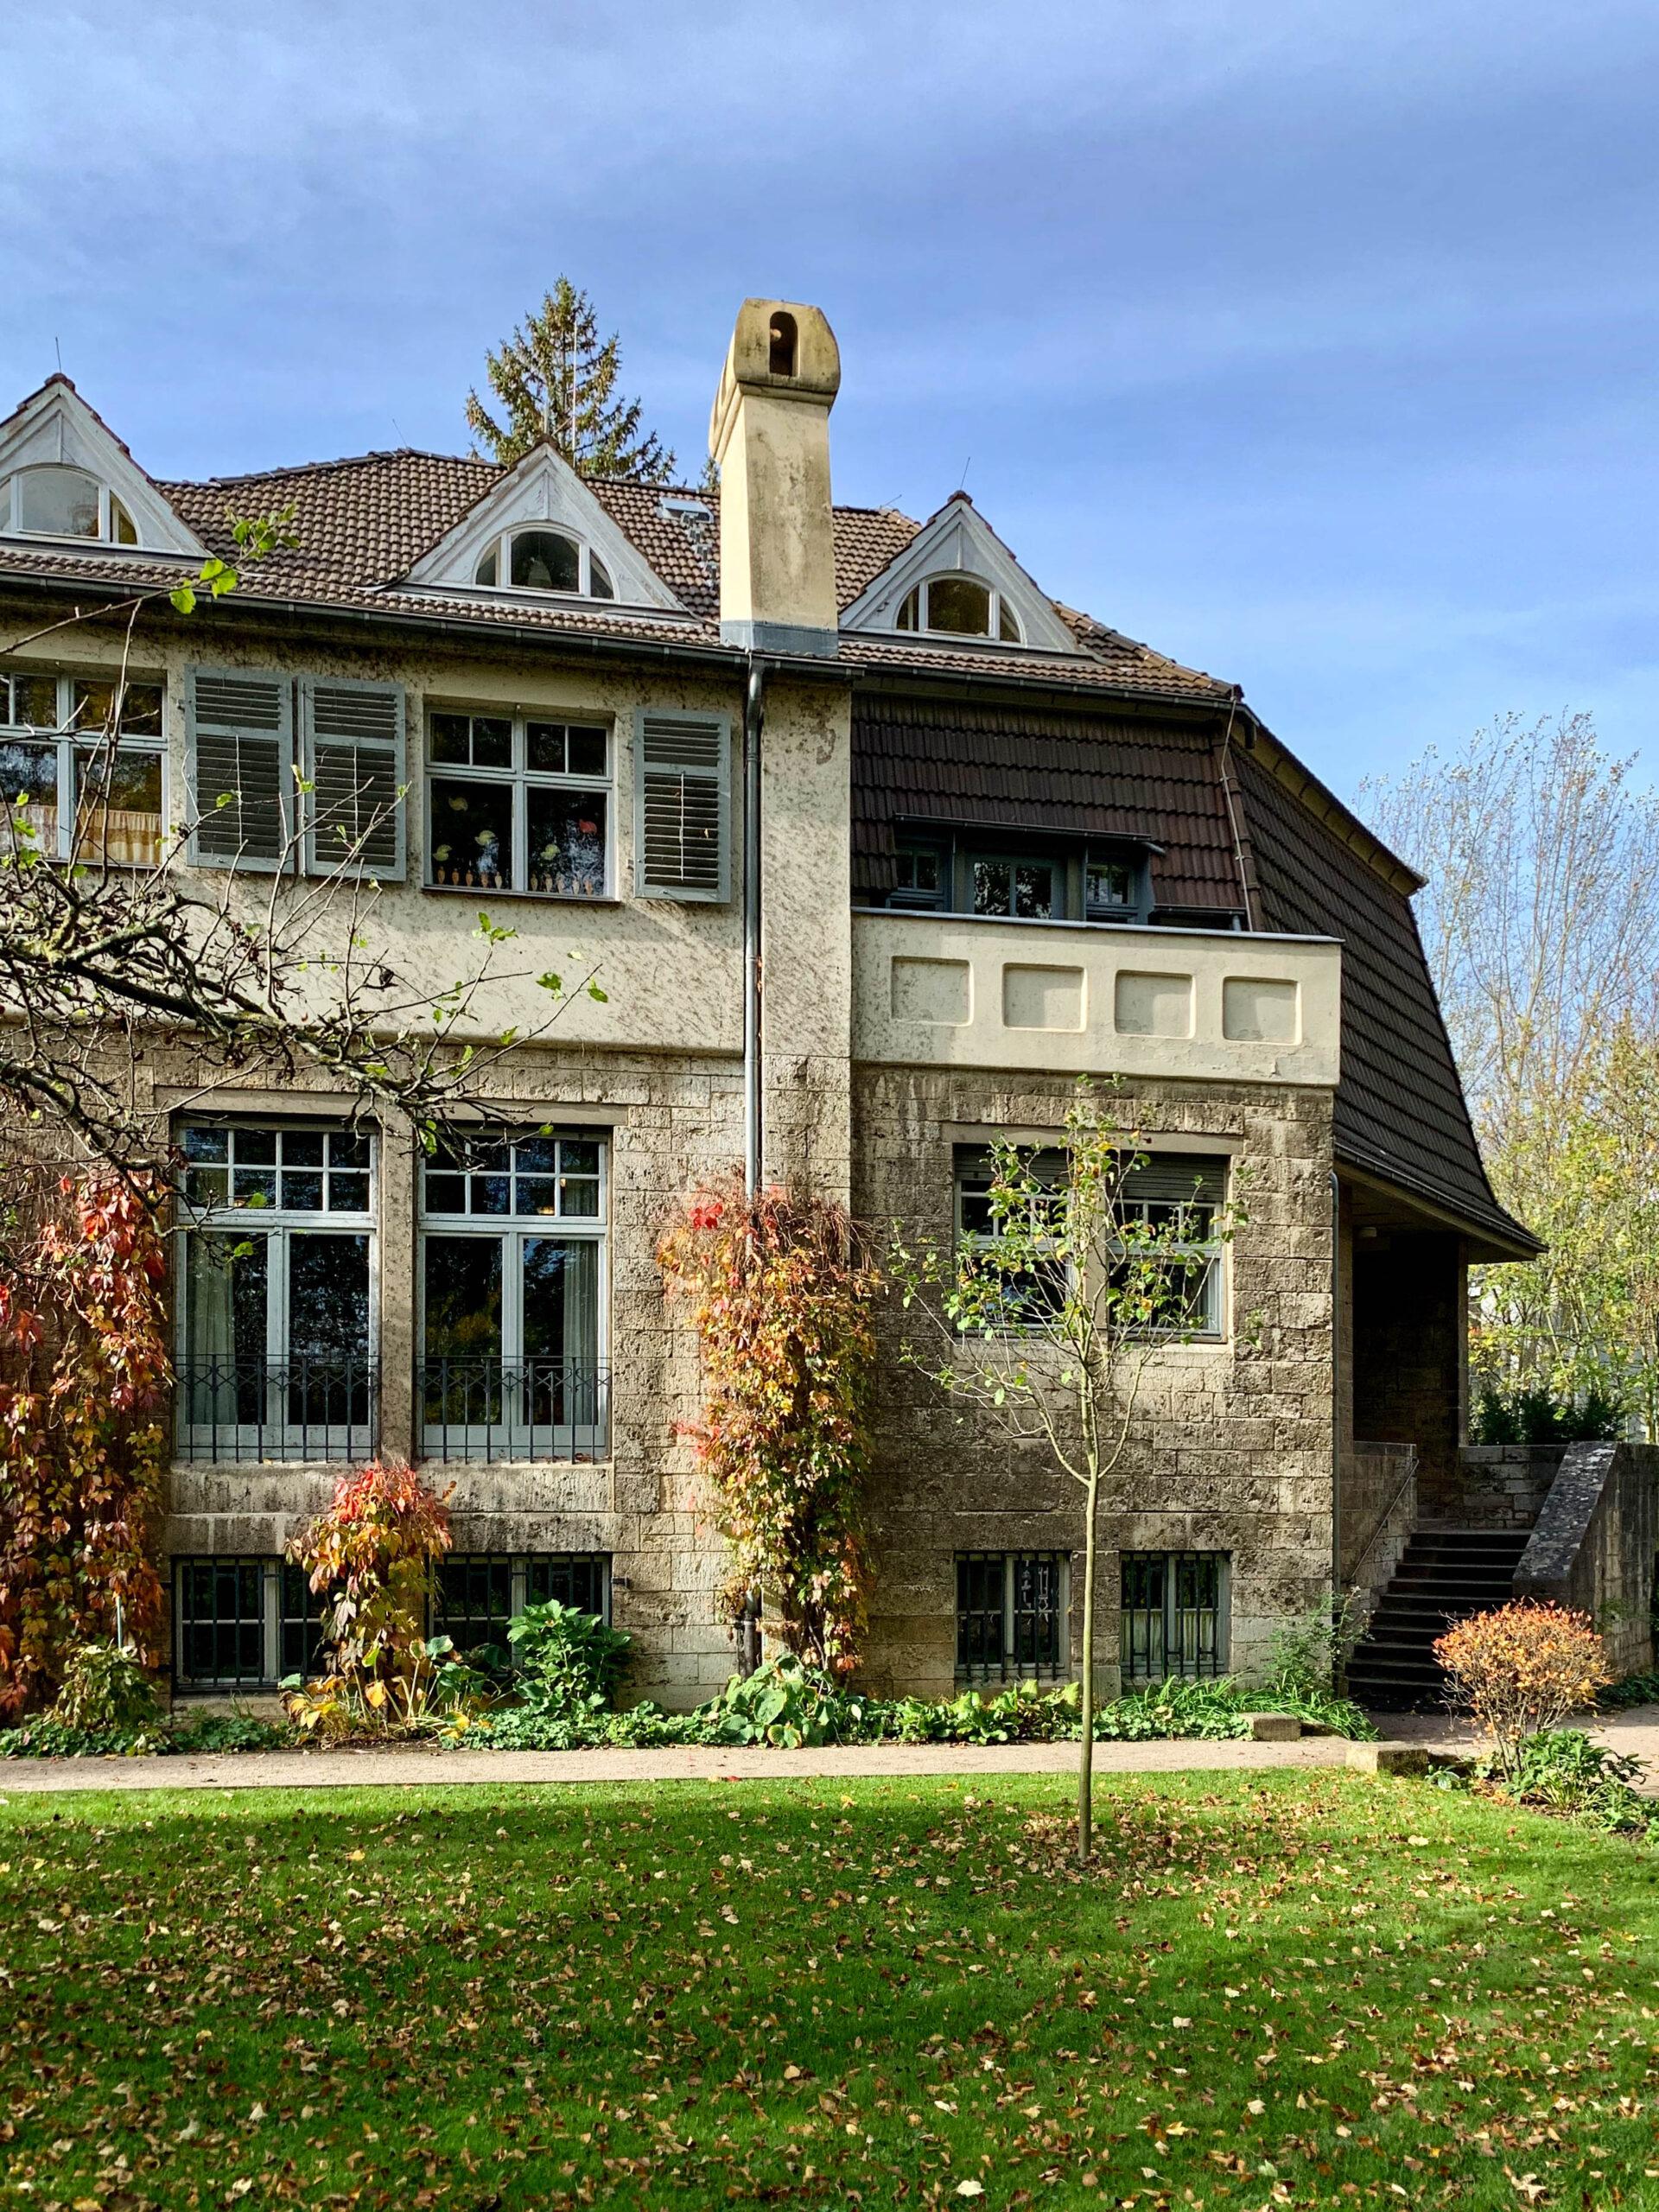 Haus Hohe Pappen, 1906-1907. Architect: Henry van de Velde